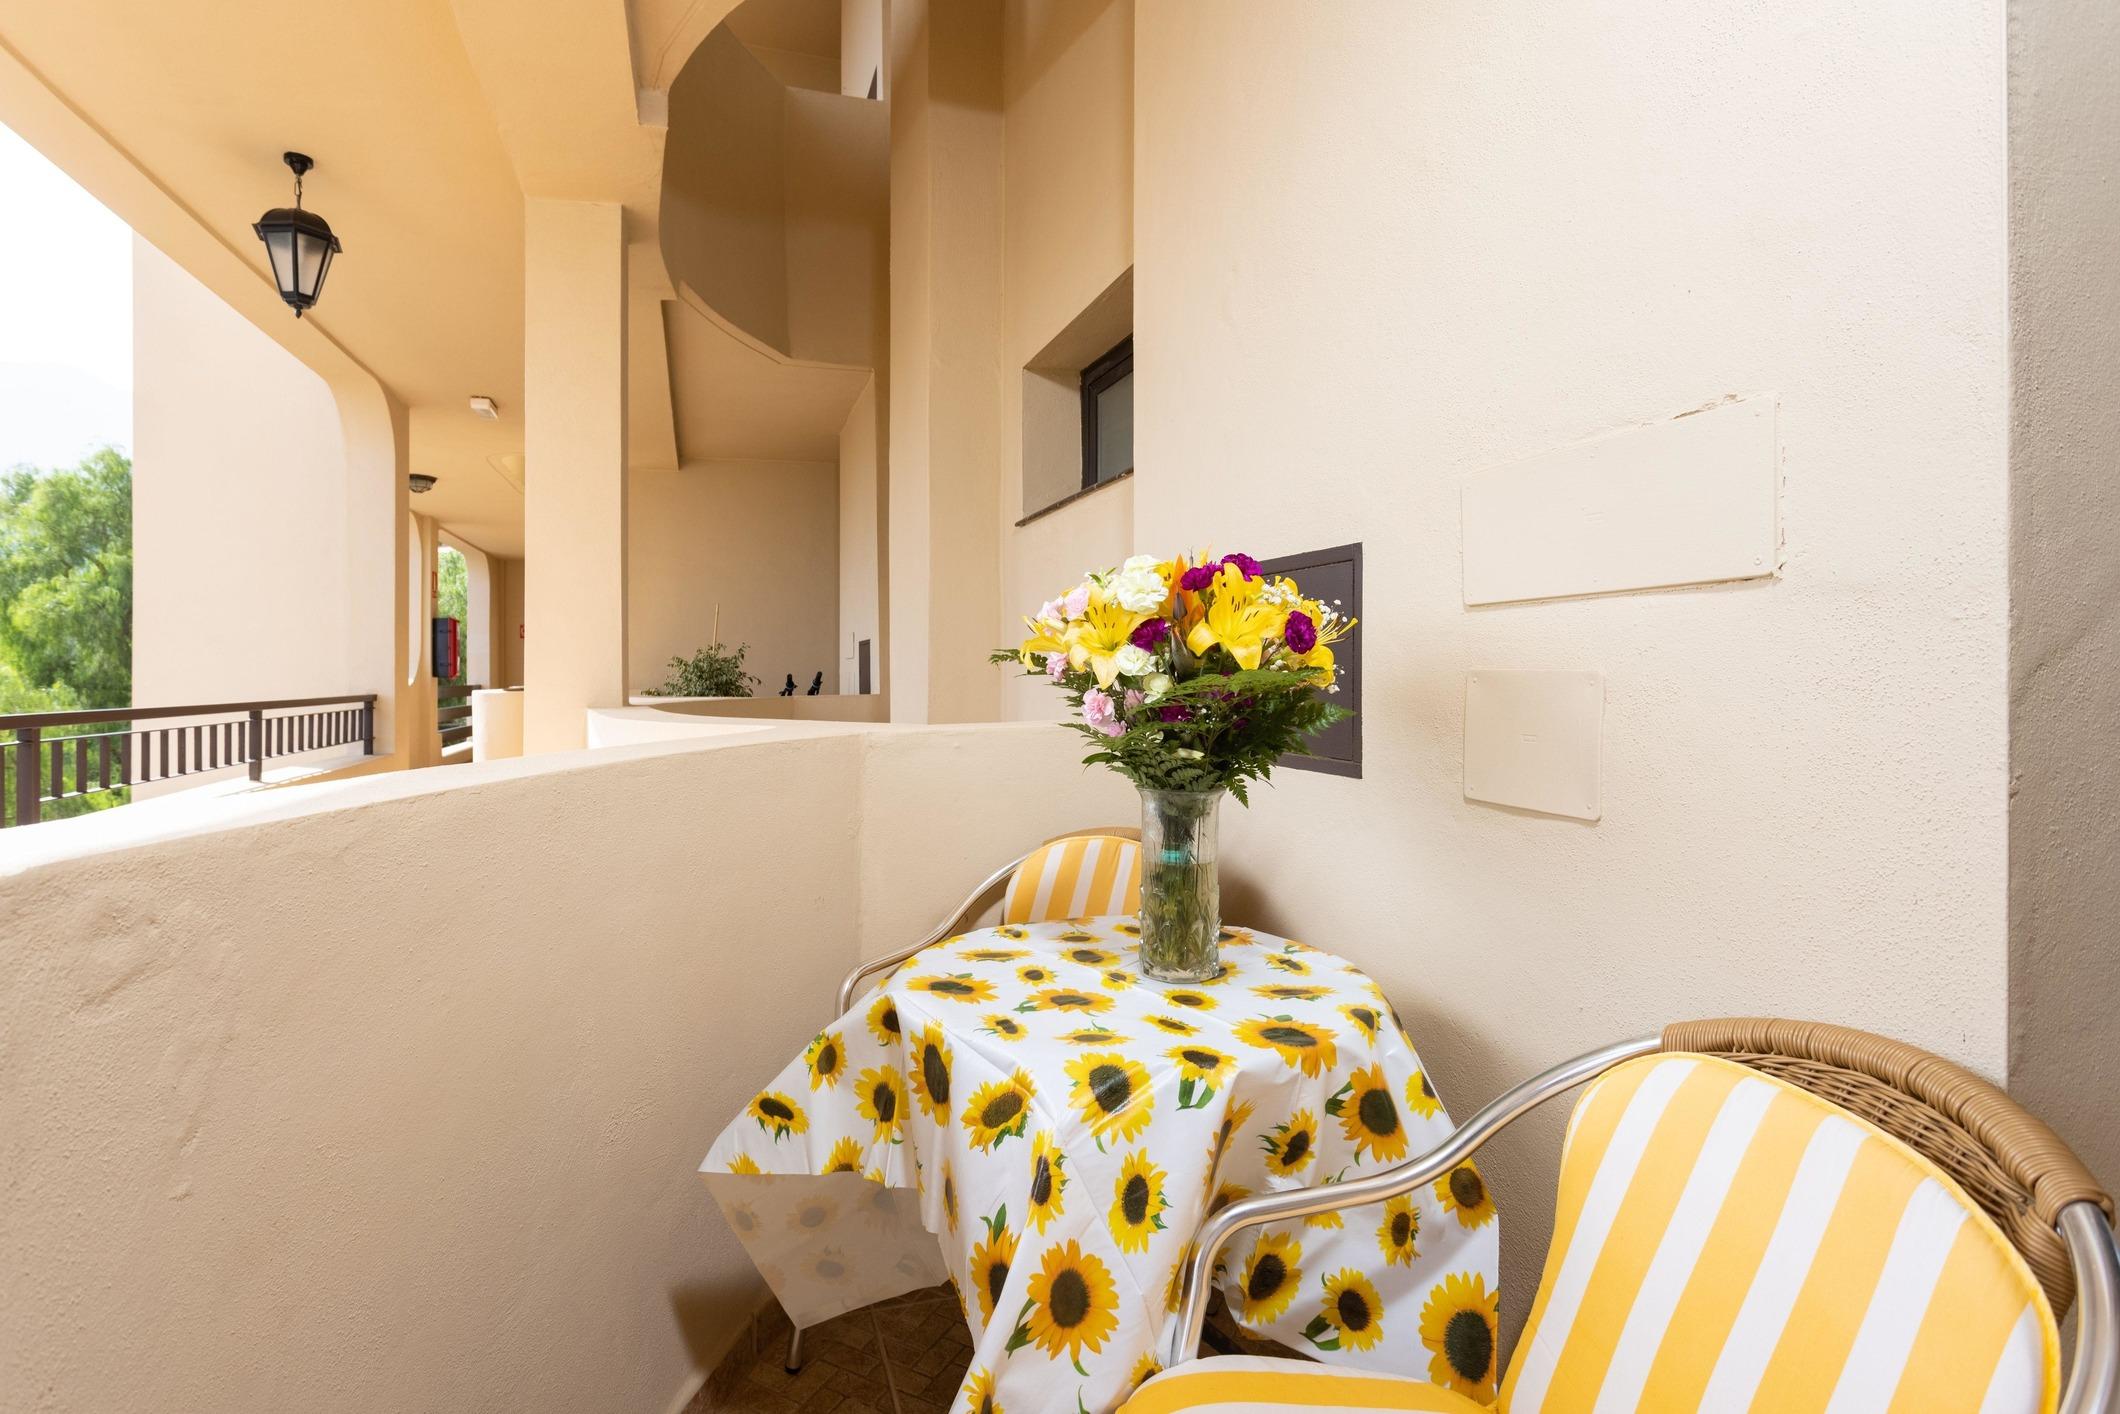 Appartement de vacances Fewo Mar y Teide Romantico, grosszügig, mit 2 Terrassen, Pool, Parkplatz,  Sicht auf Meer  (2492990), Puerto de la Cruz, Ténérife, Iles Canaries, Espagne, image 10